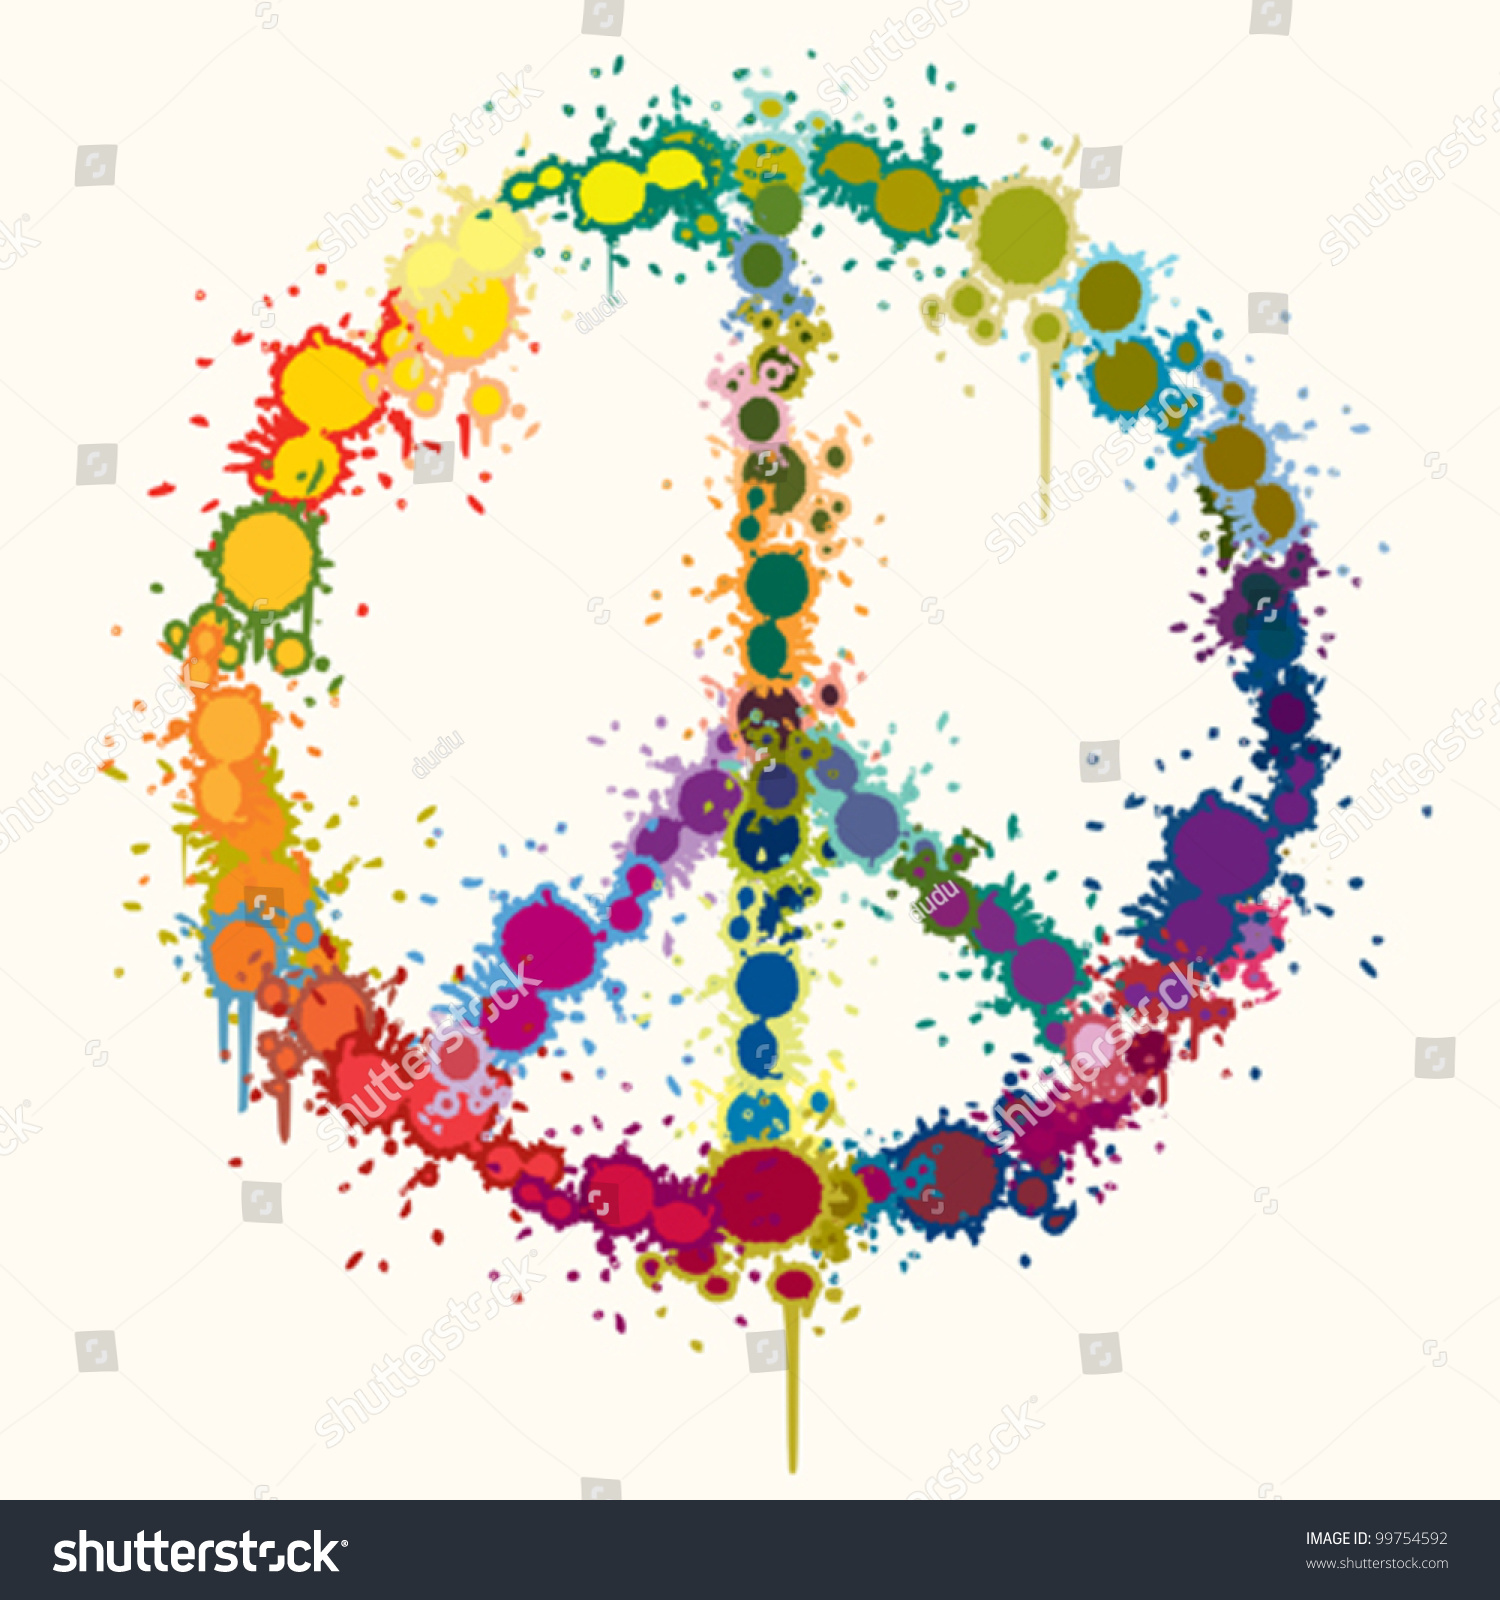 colorful peace sign backgrounds wallpapersafari